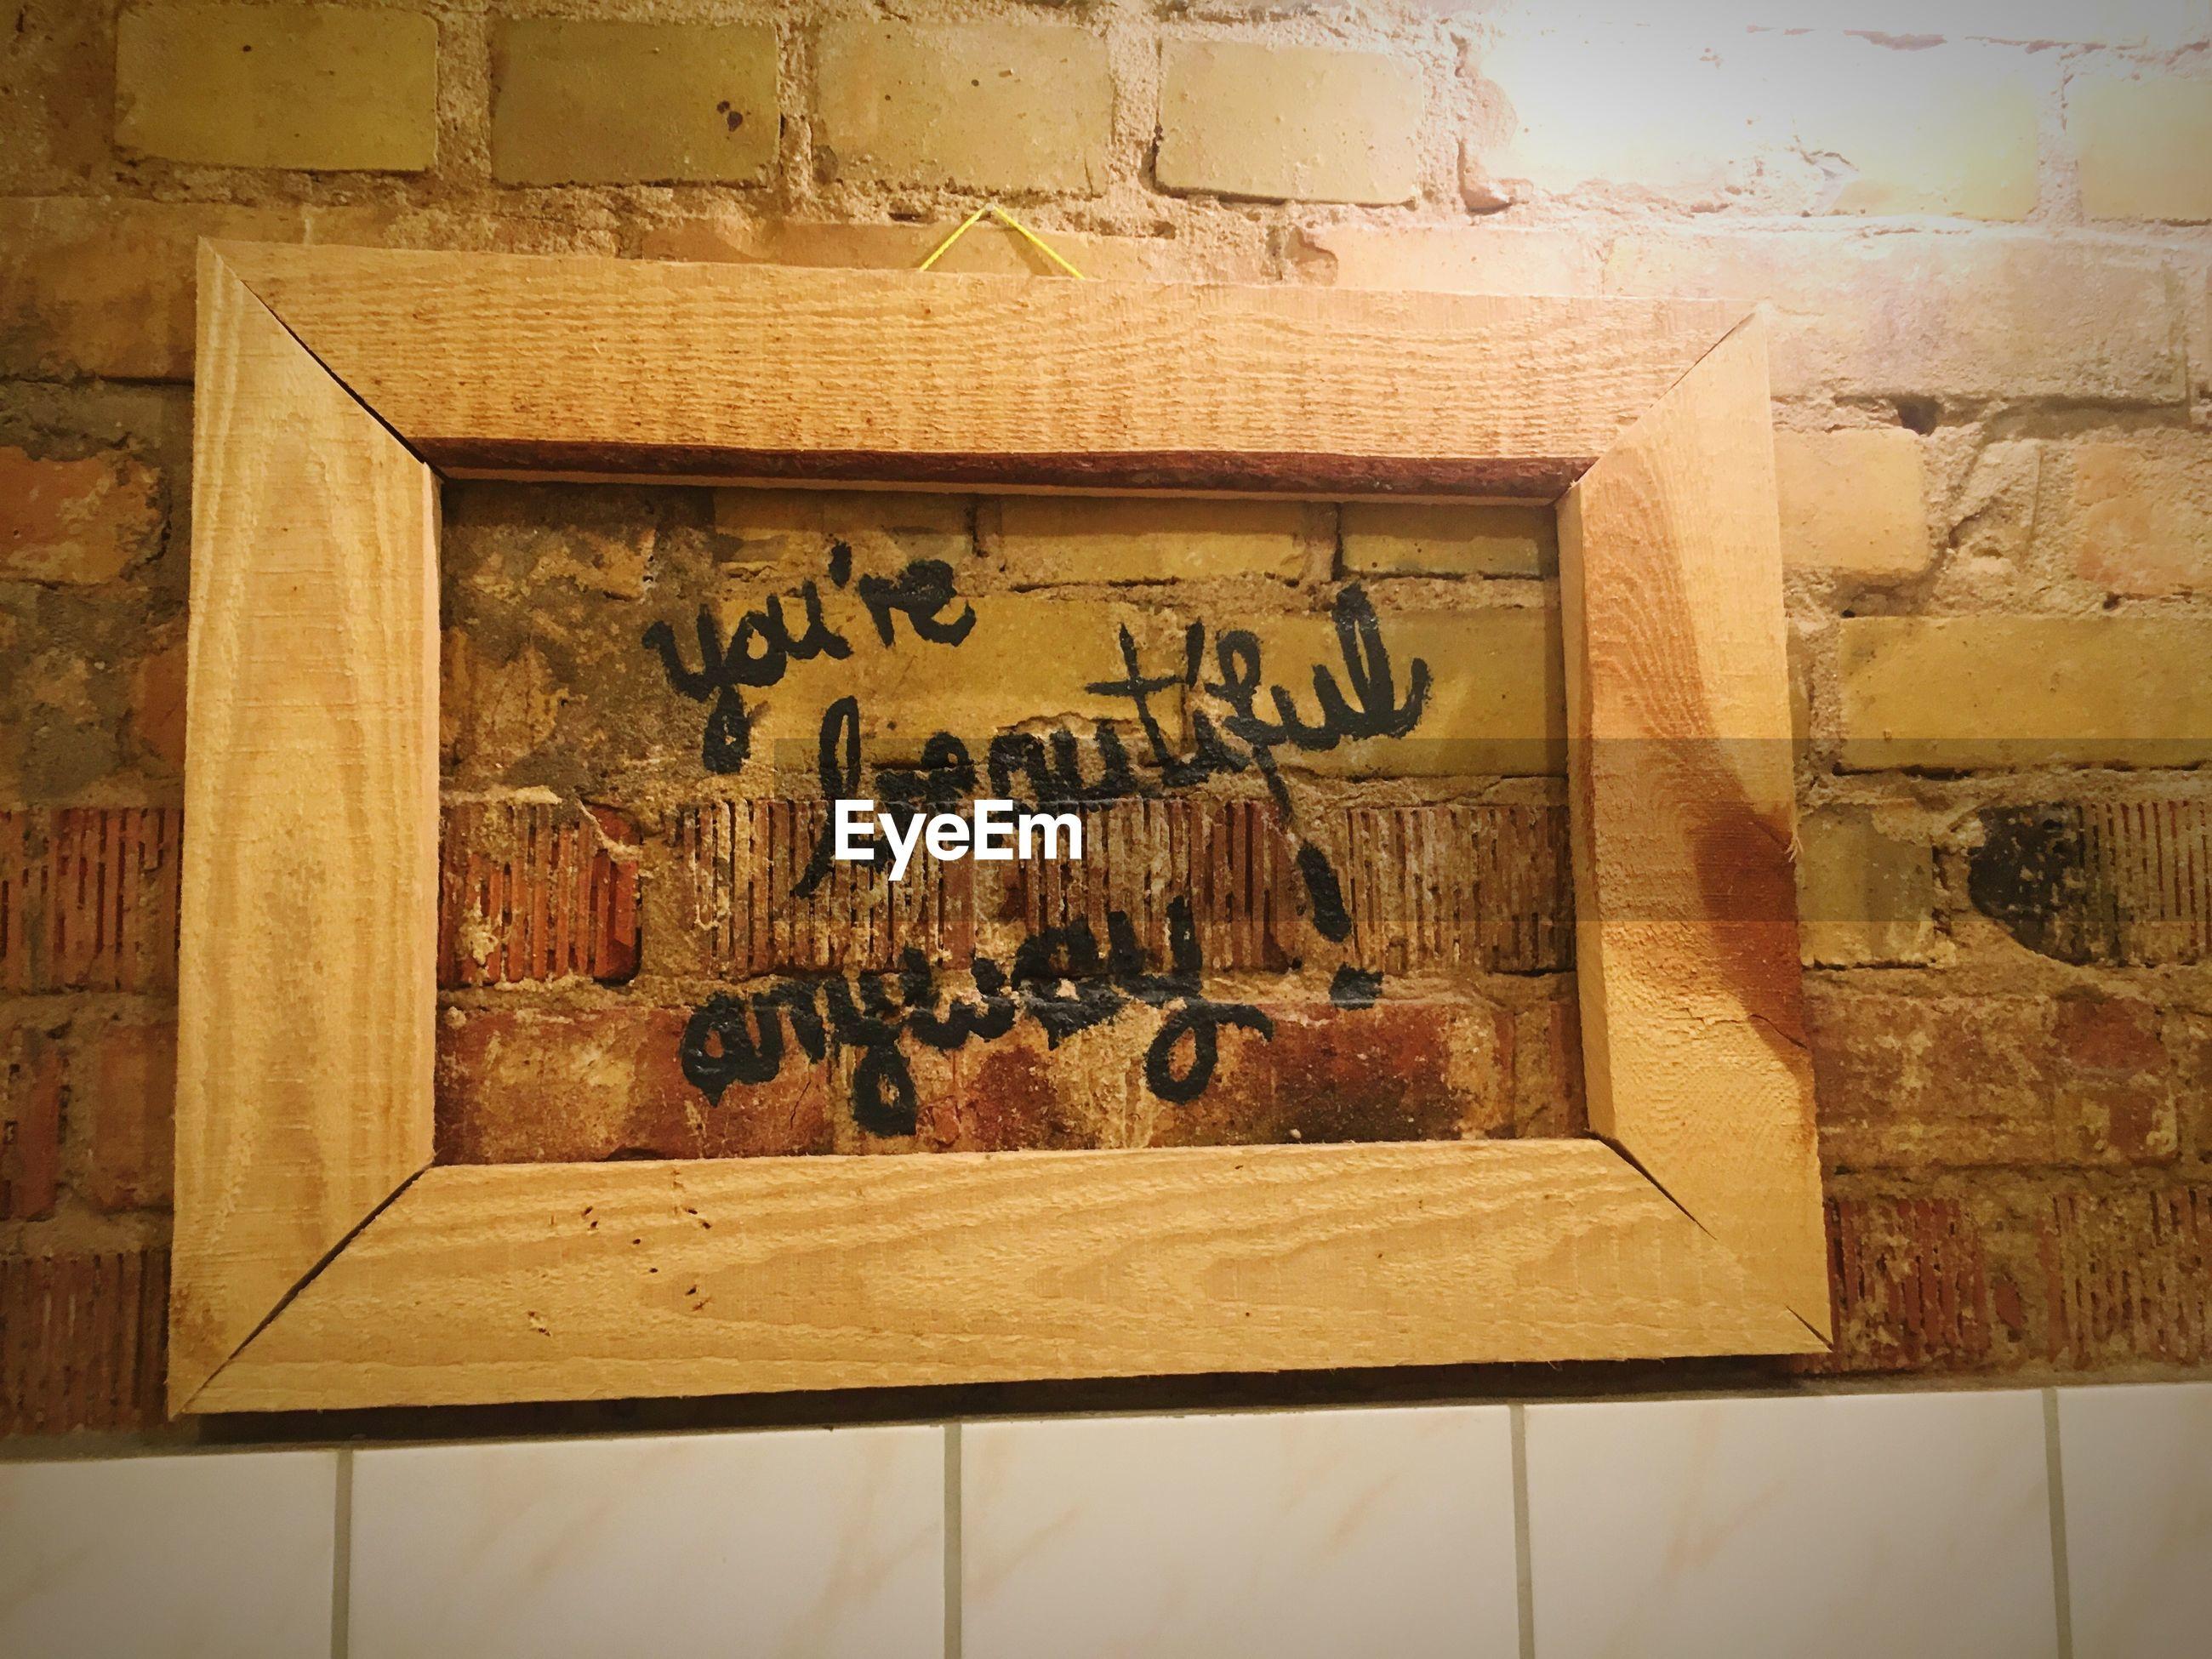 TEXT WRITTEN ON WALL